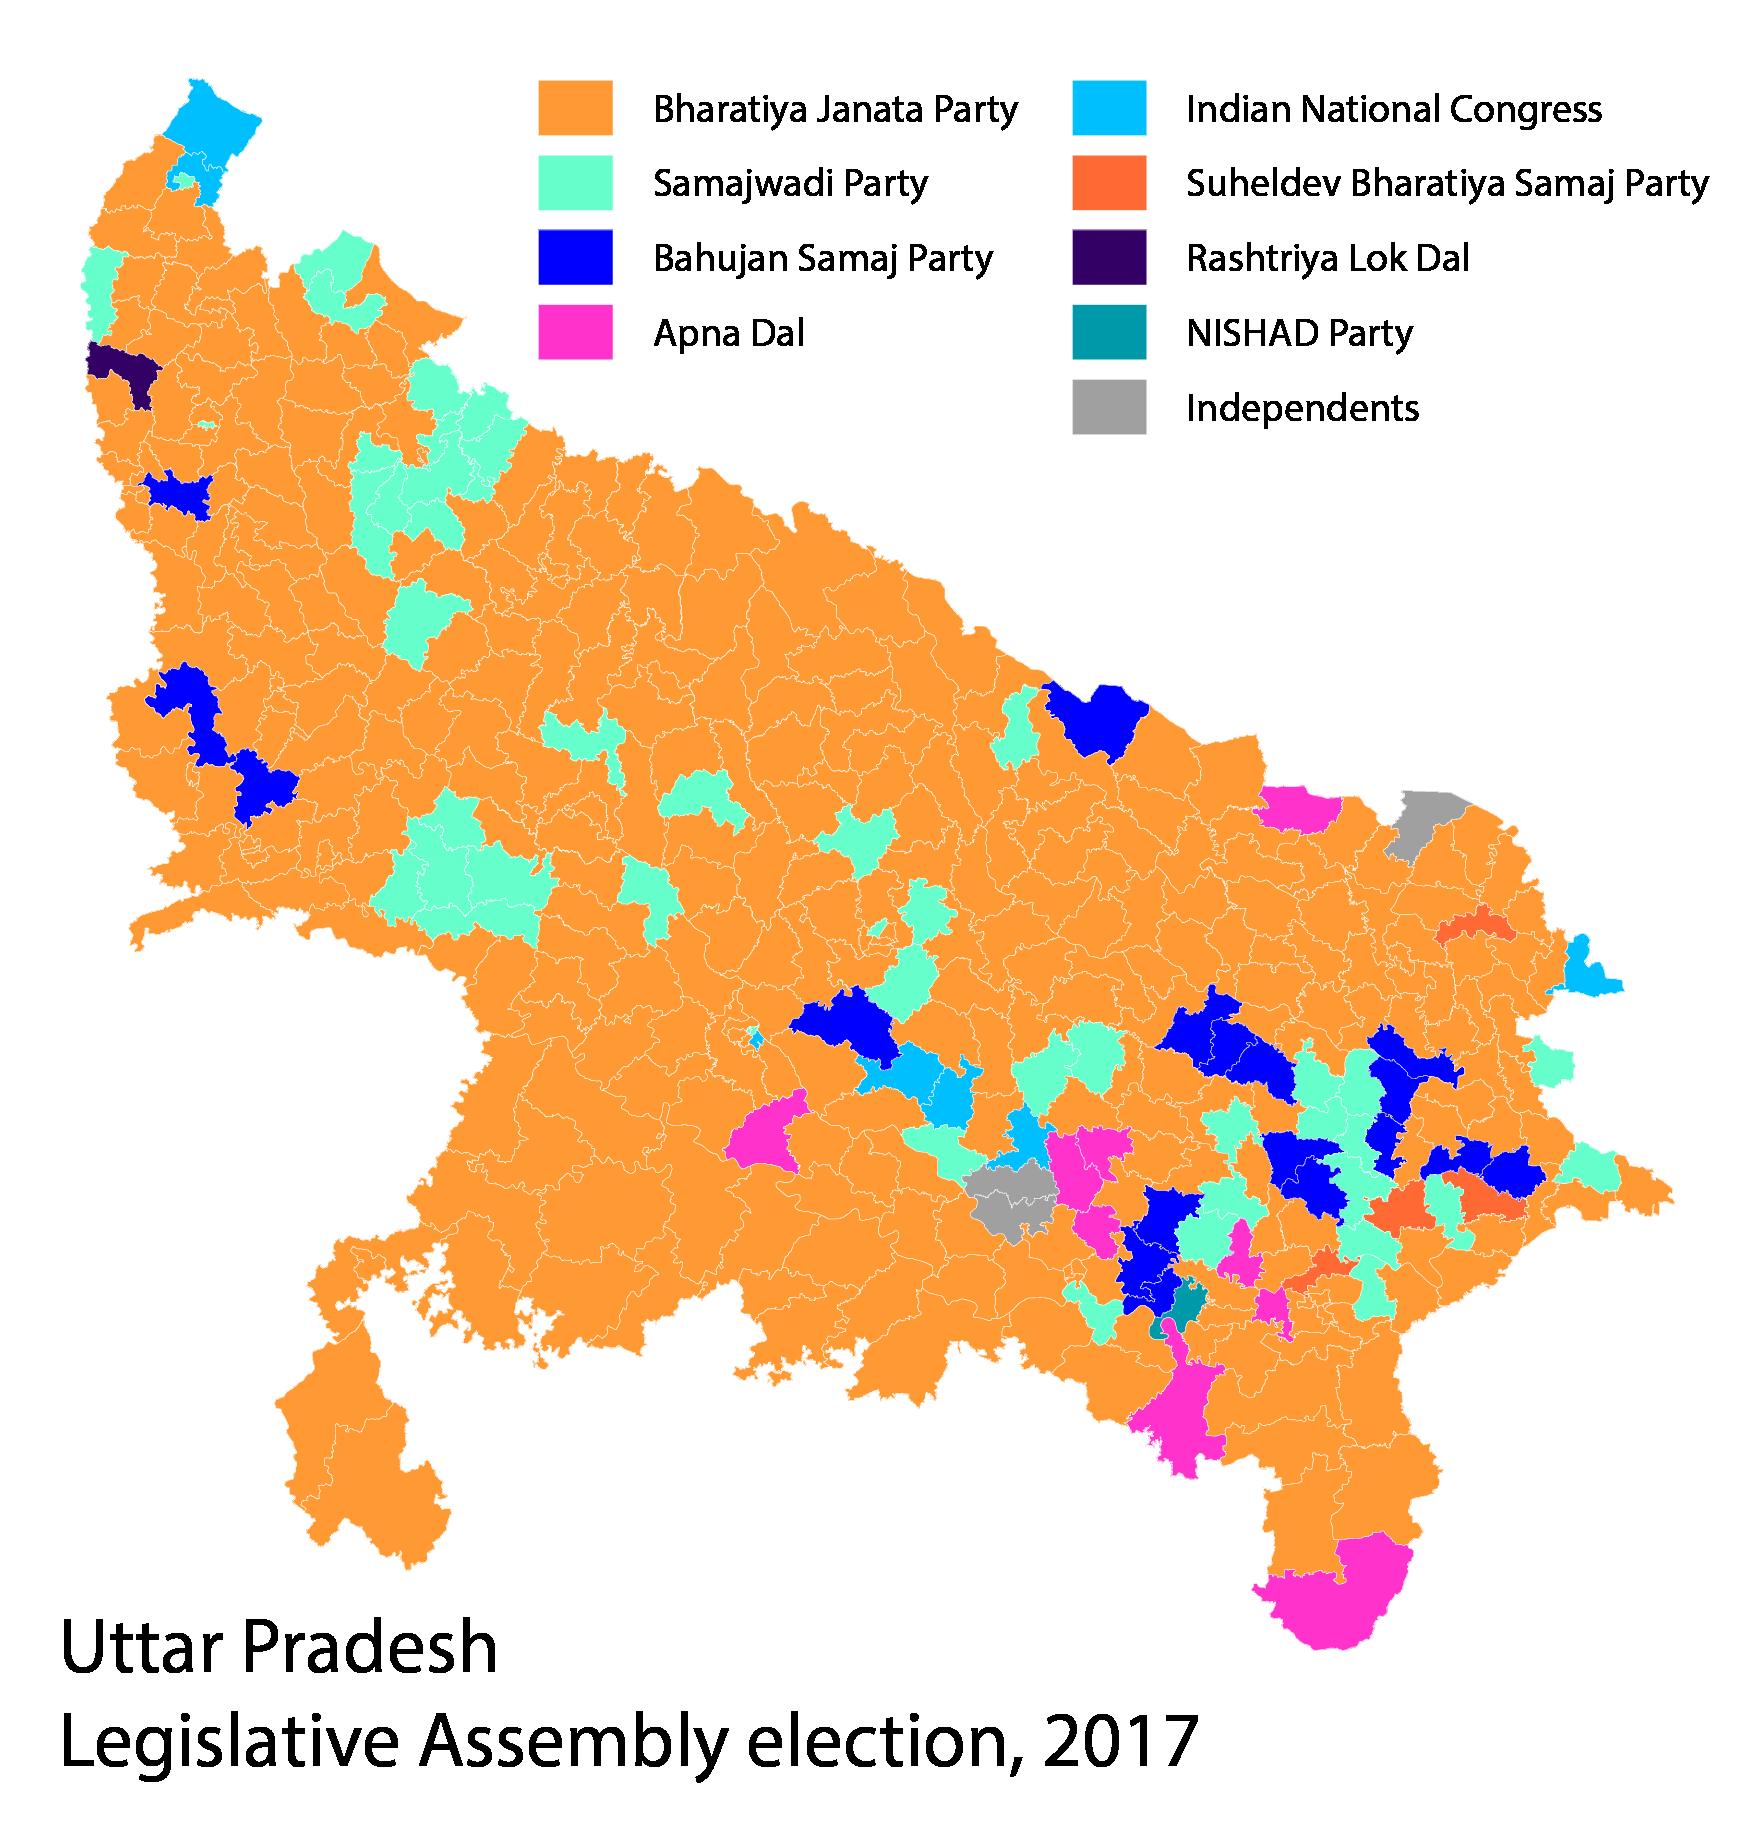 2017 Uttar Pradesh Legislative Assembly election.